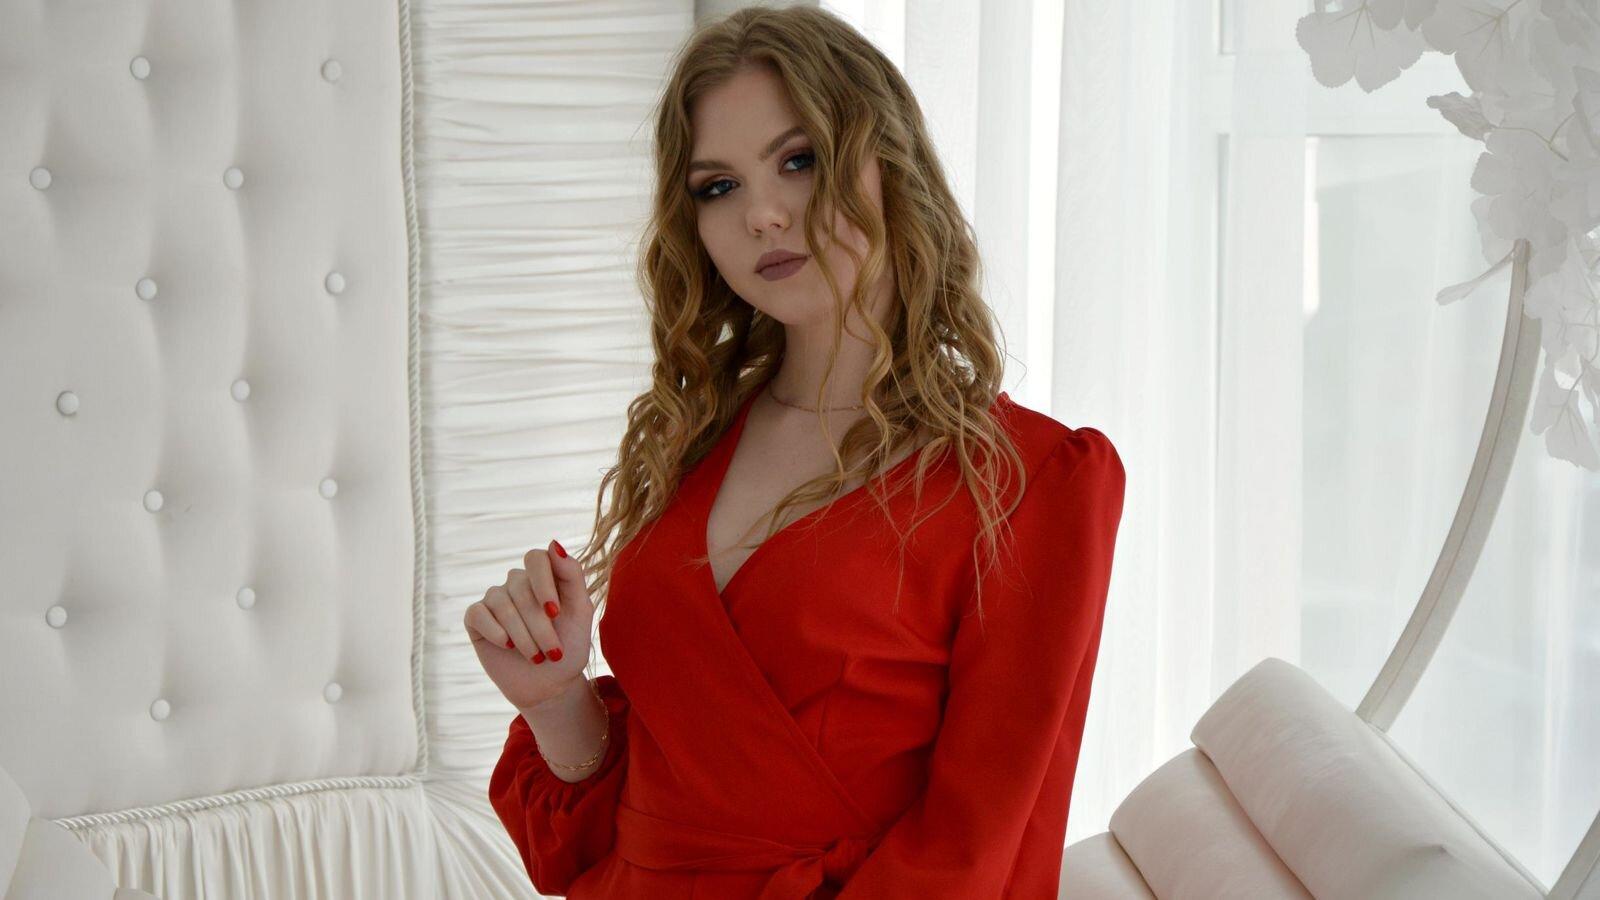 ElizabetBonk